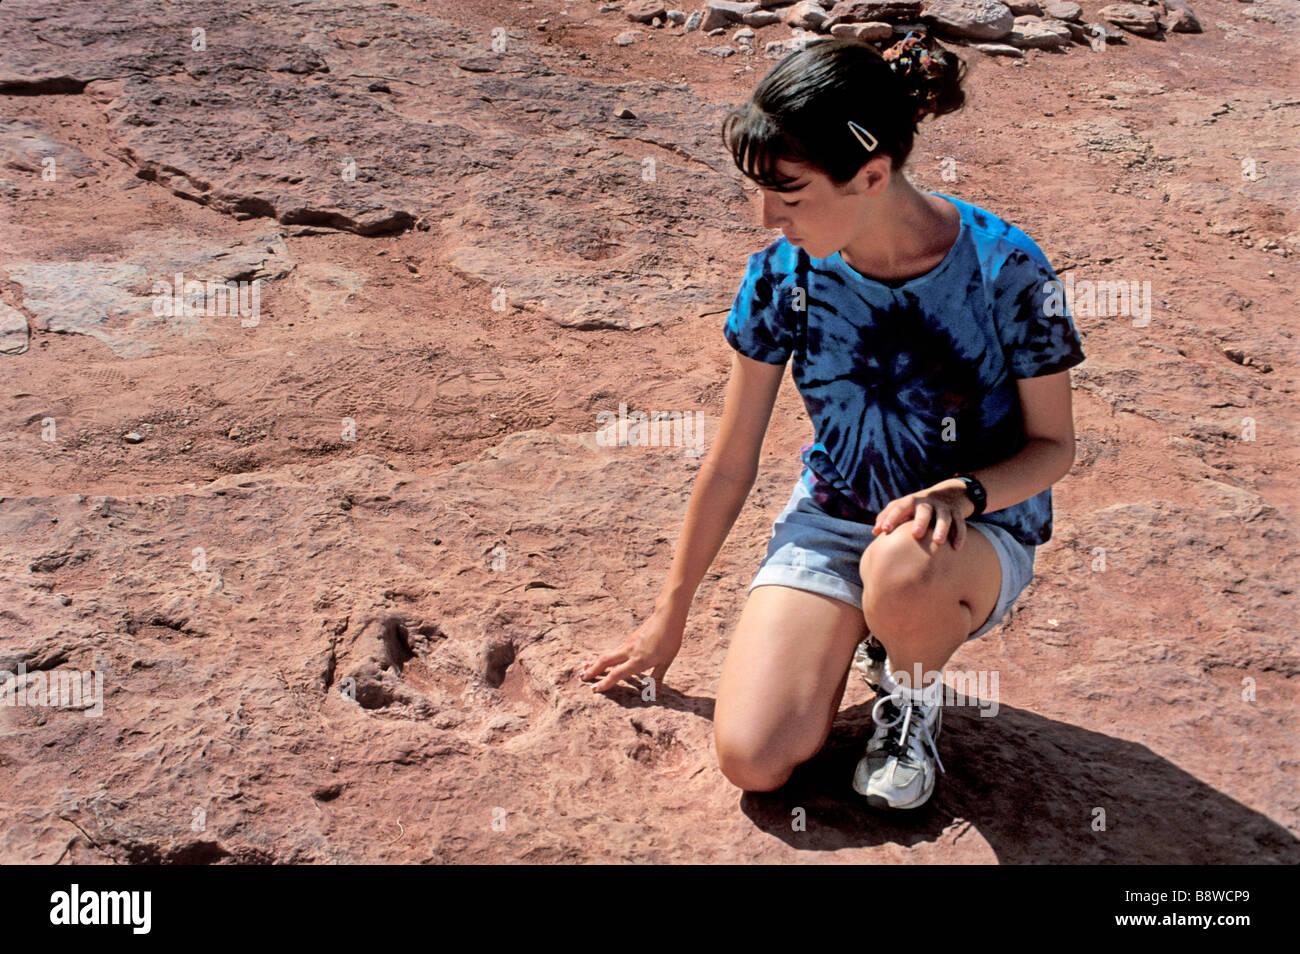 Teenage girl looking at fossil dinosaur footprint near Tuba City Arizona - Stock Image